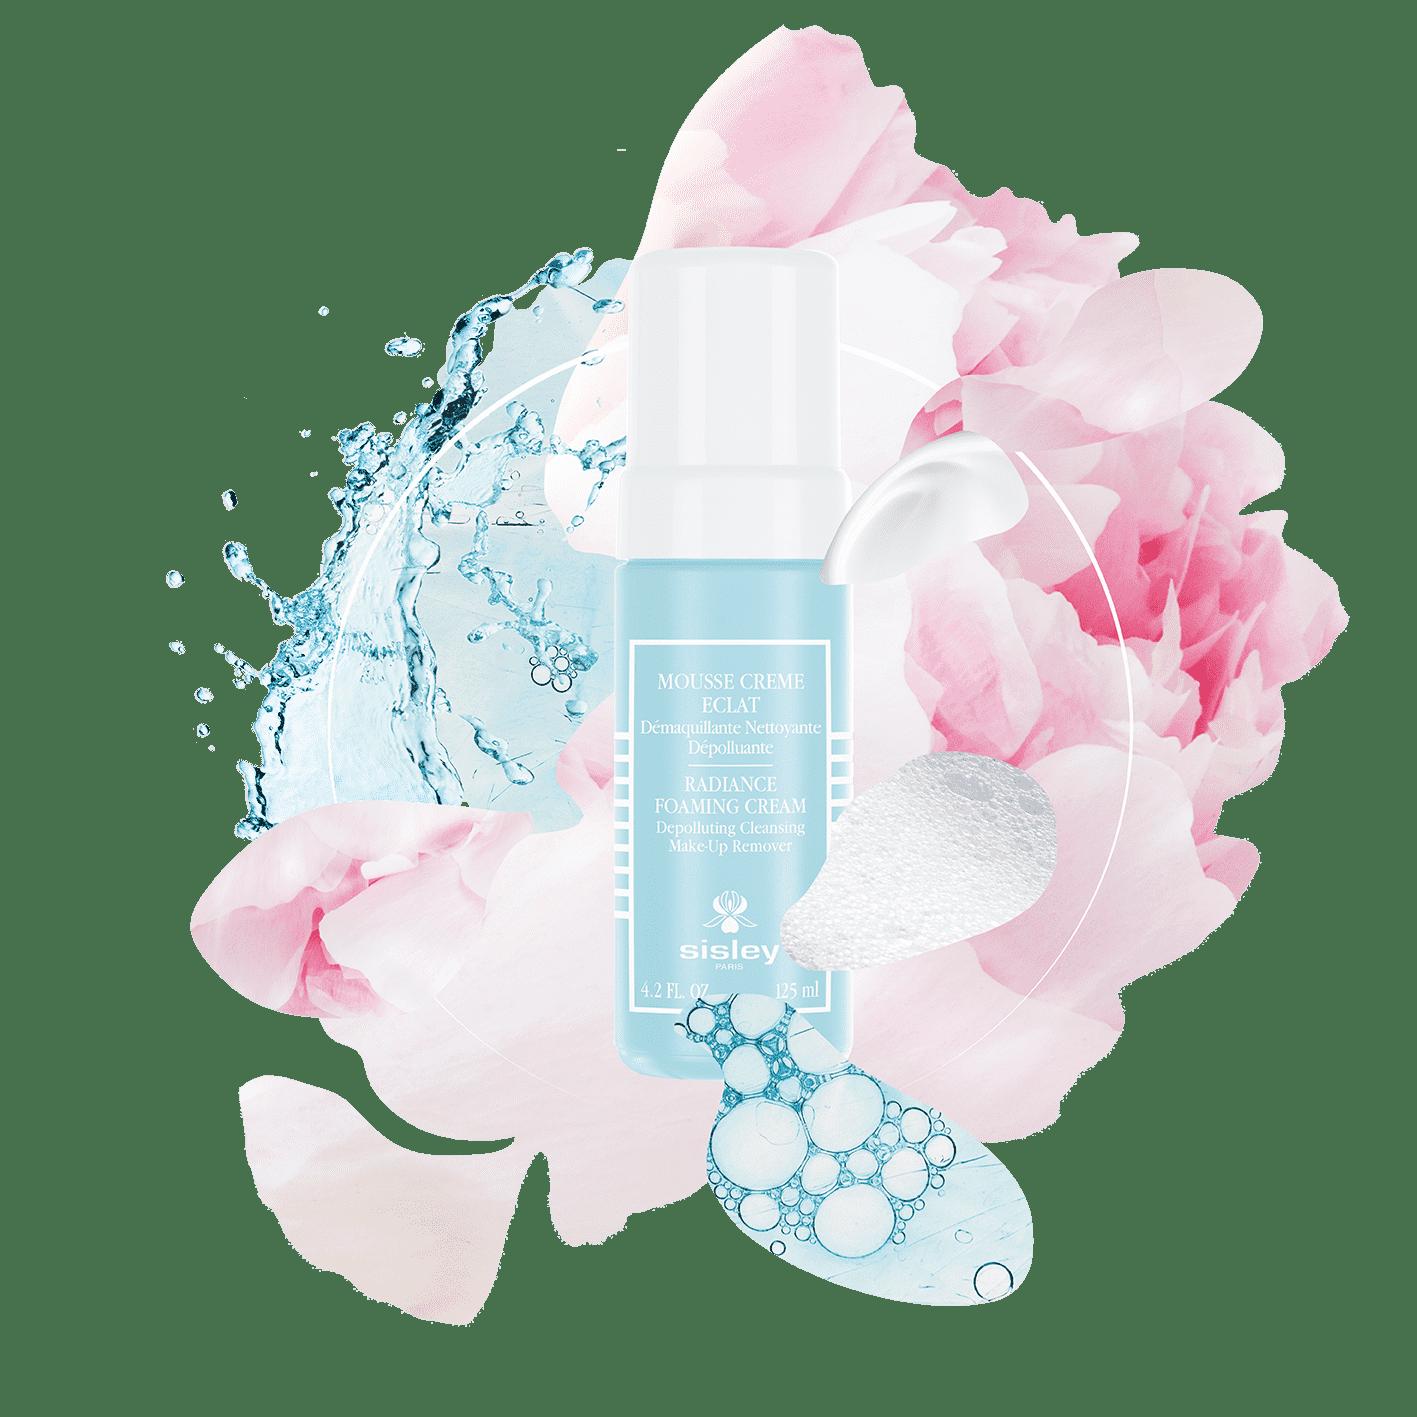 Sisley-Radiance-Foaming-Cream-Visuel-Ambiance-2